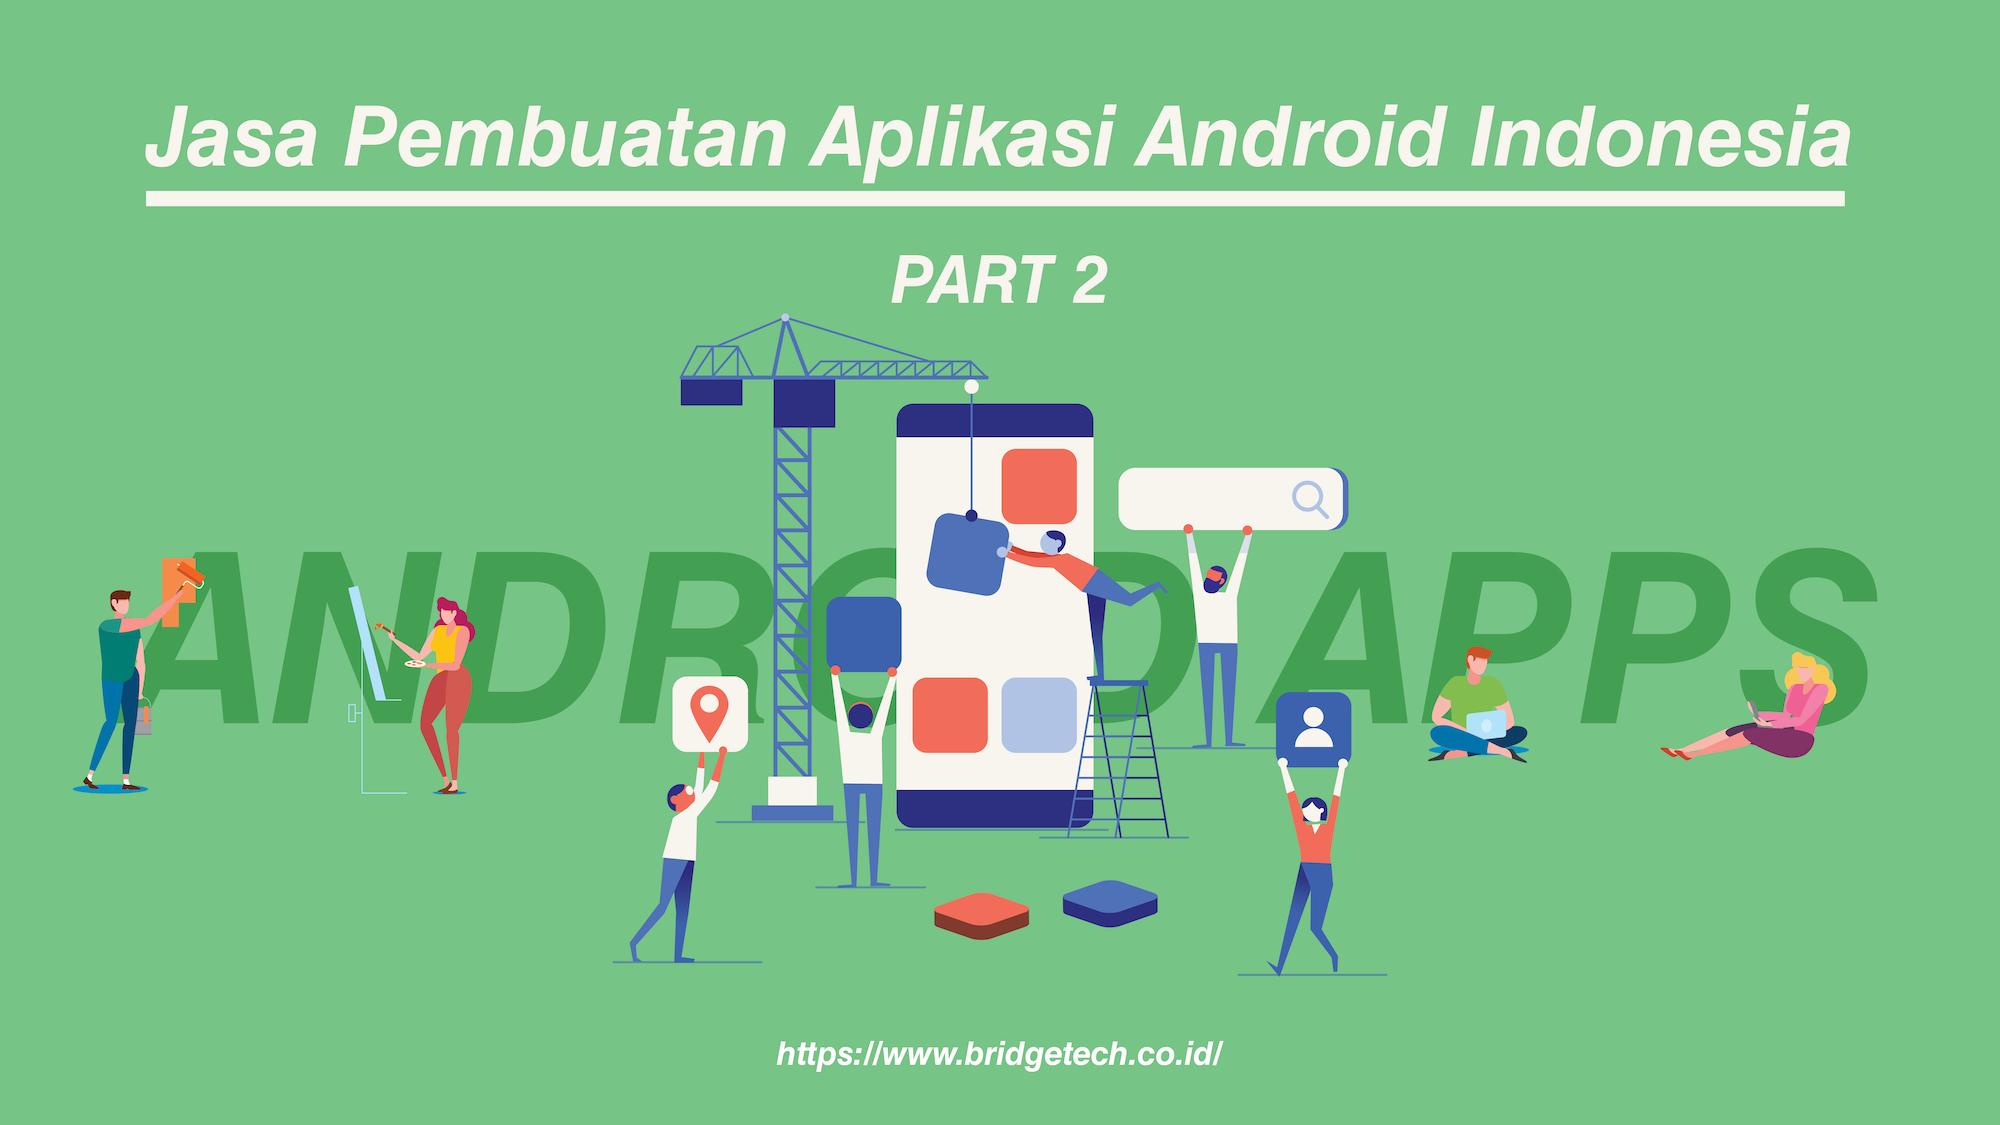 Jasa Pembuatan Aplikasi Android Indonesia (Pt.2)